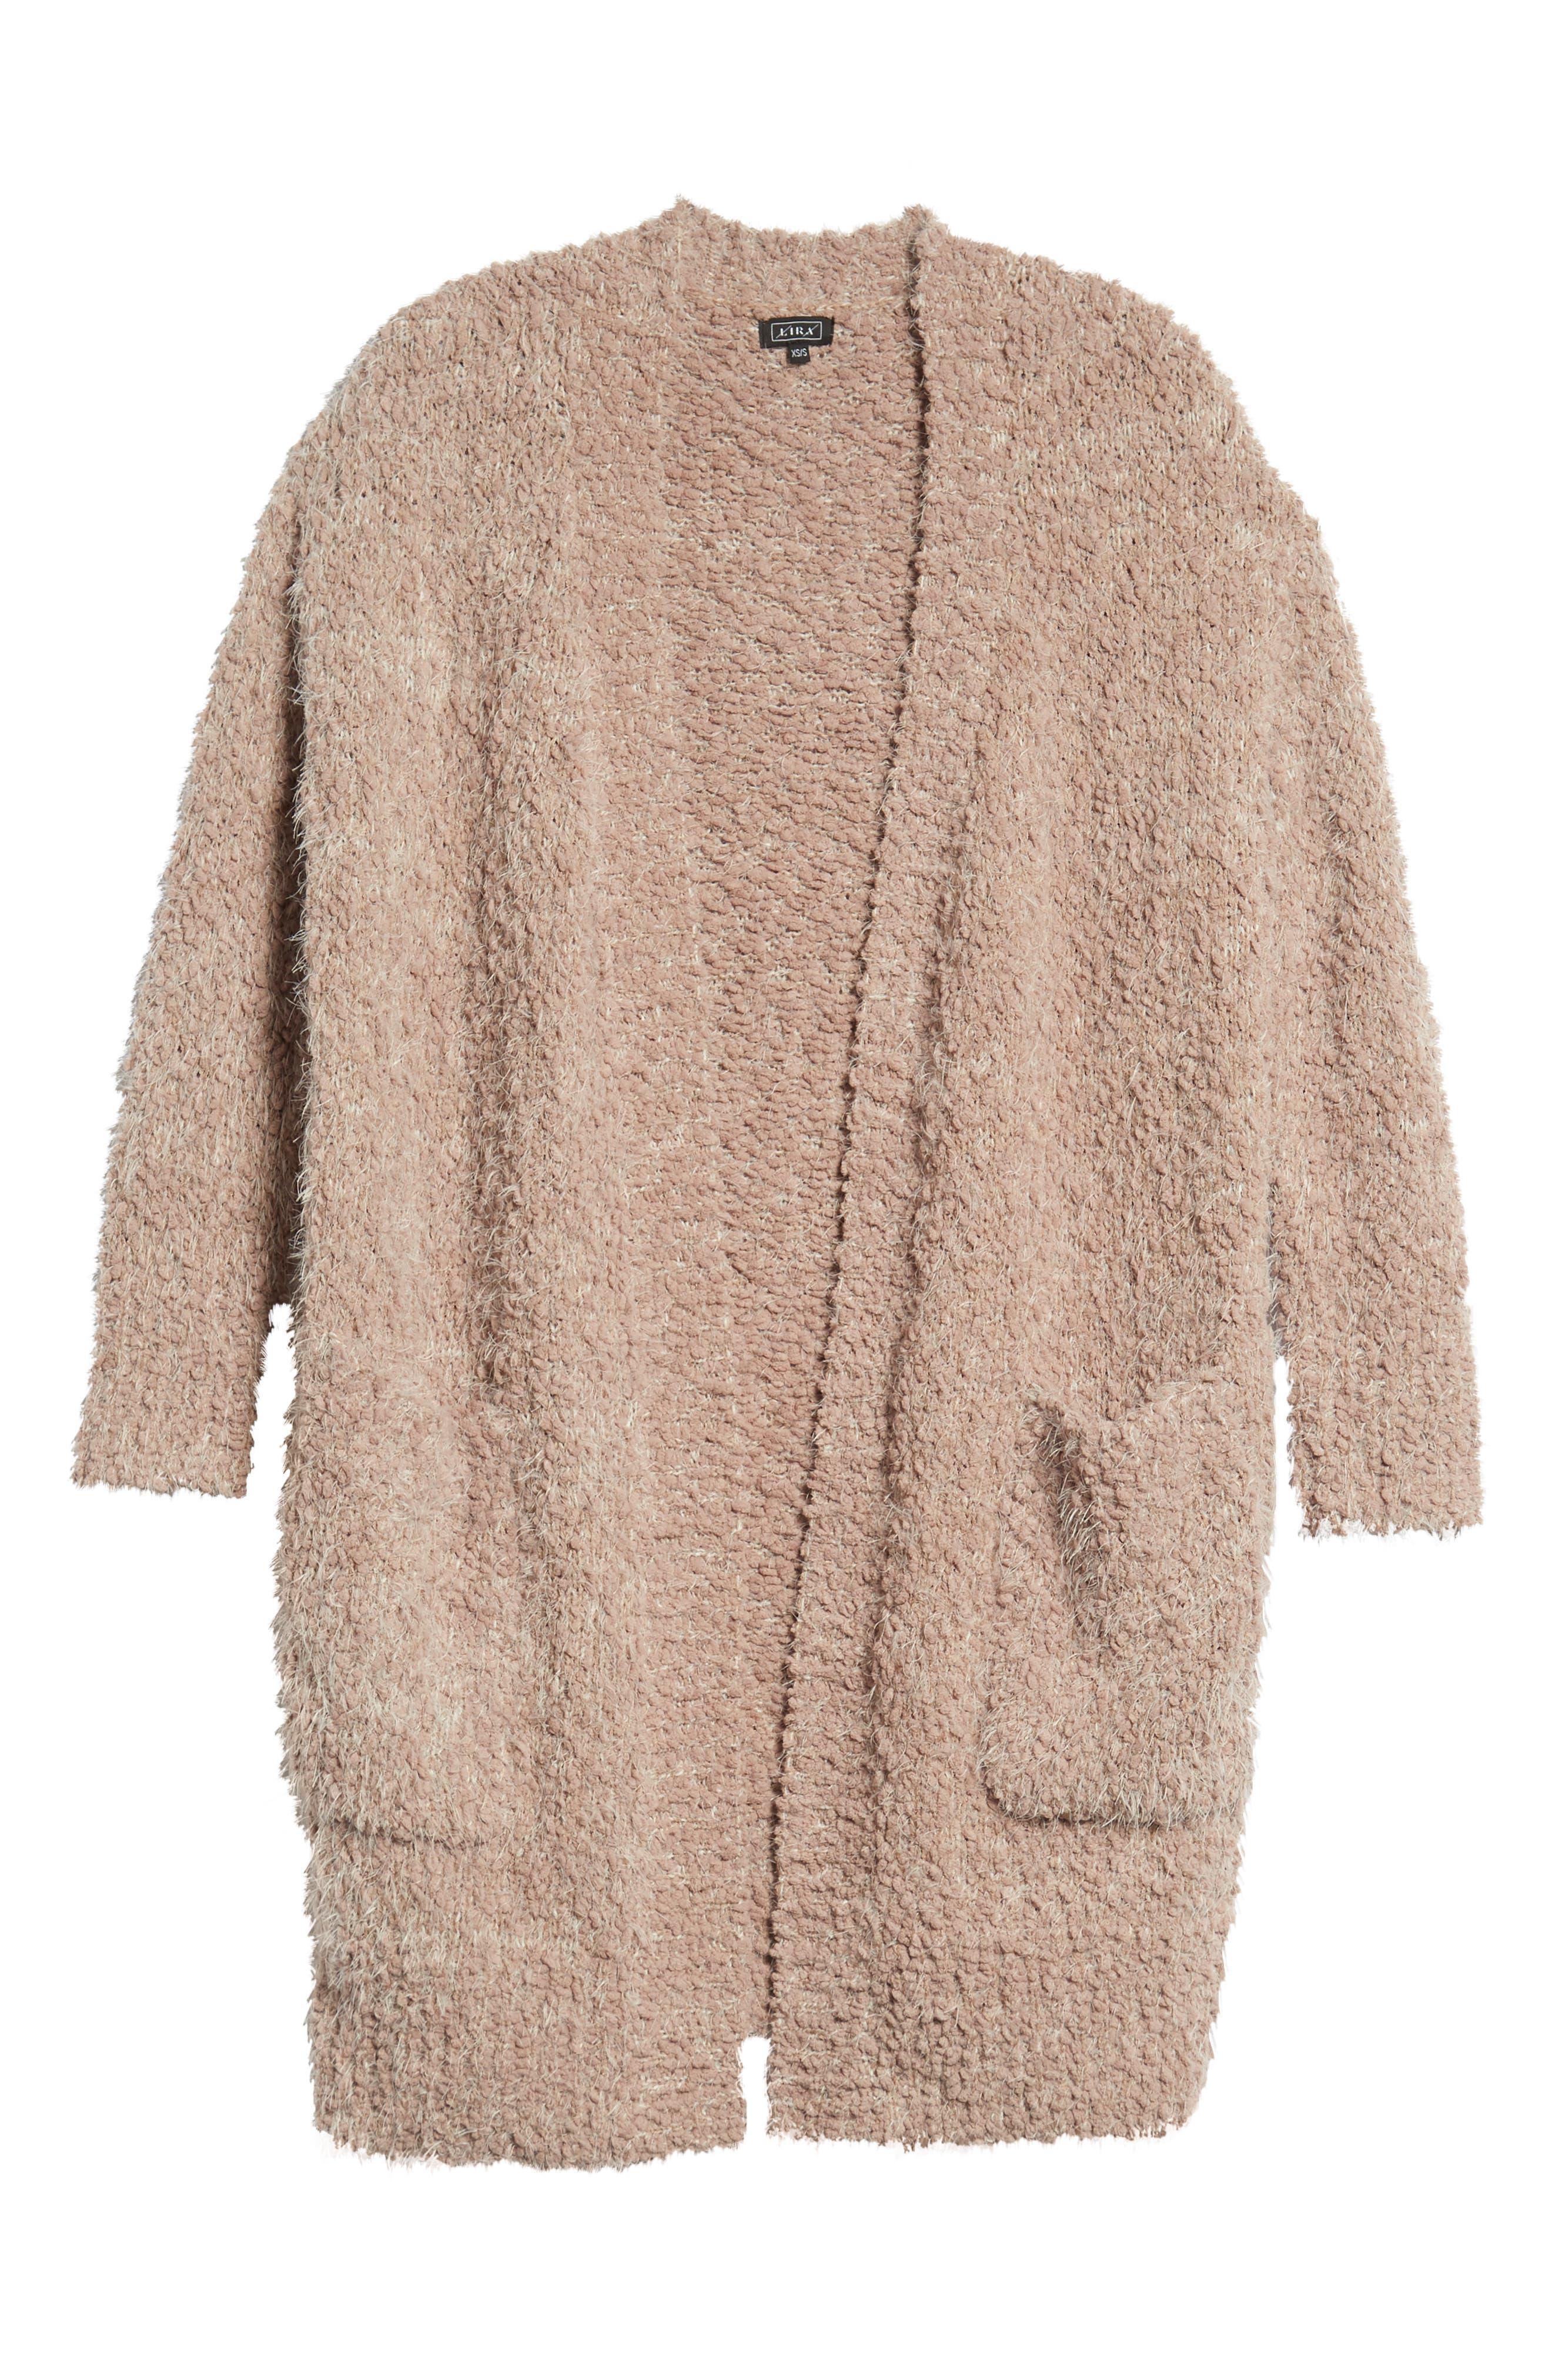 LIRA CLOTHING,                             Miranda Knit Cardigan,                             Alternate thumbnail 6, color,                             DUSTY ROSE